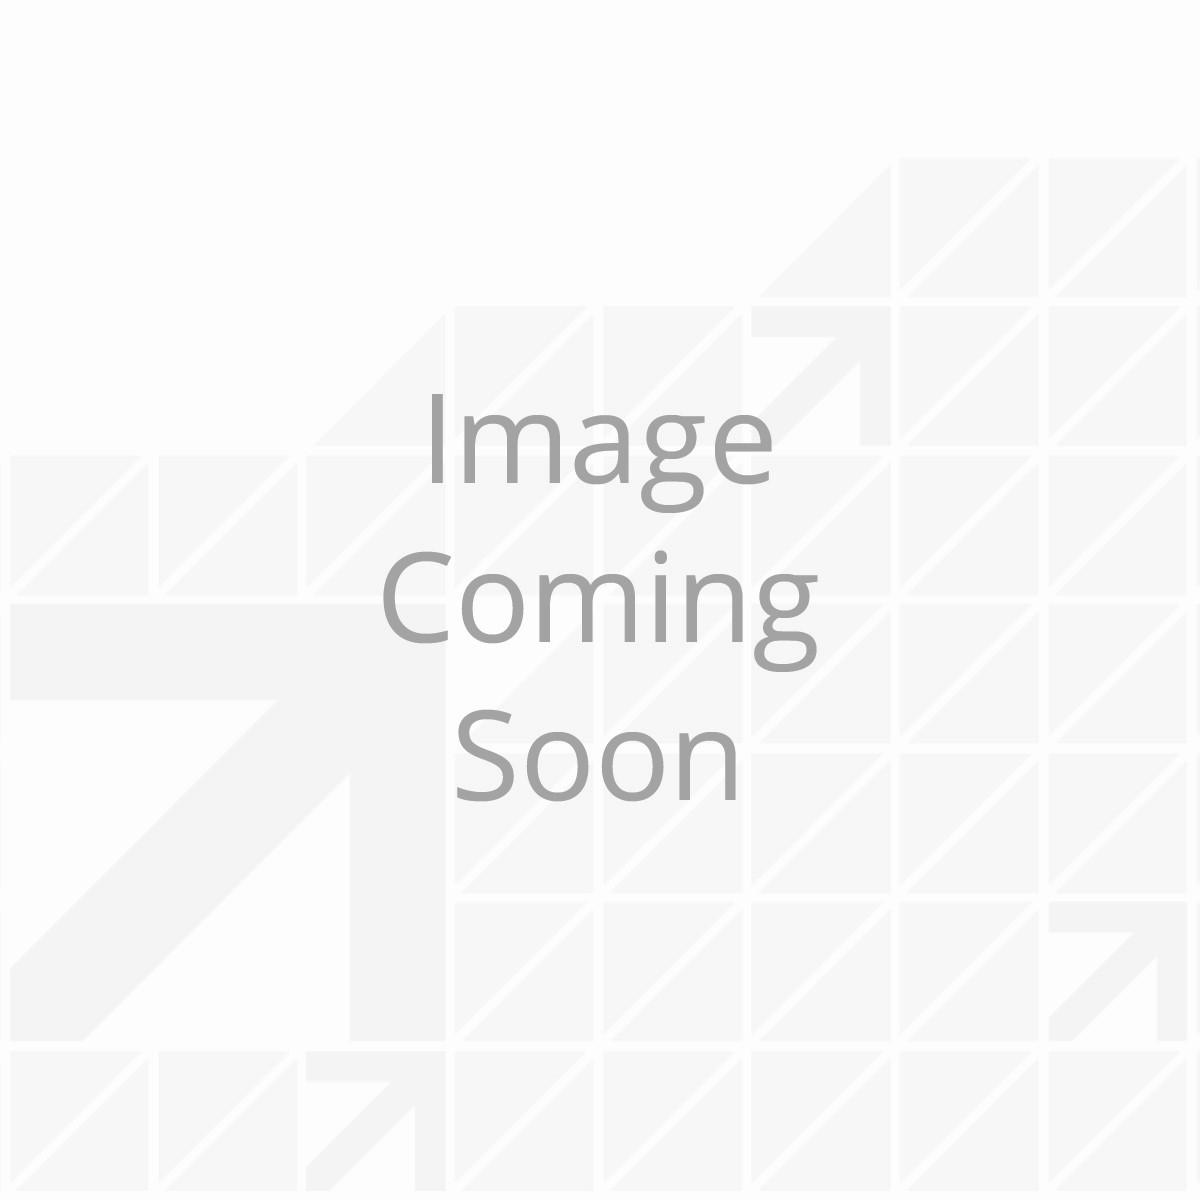 Xmc 3.51 X 1.86 X 2.5 X 2.5 Pc Gray